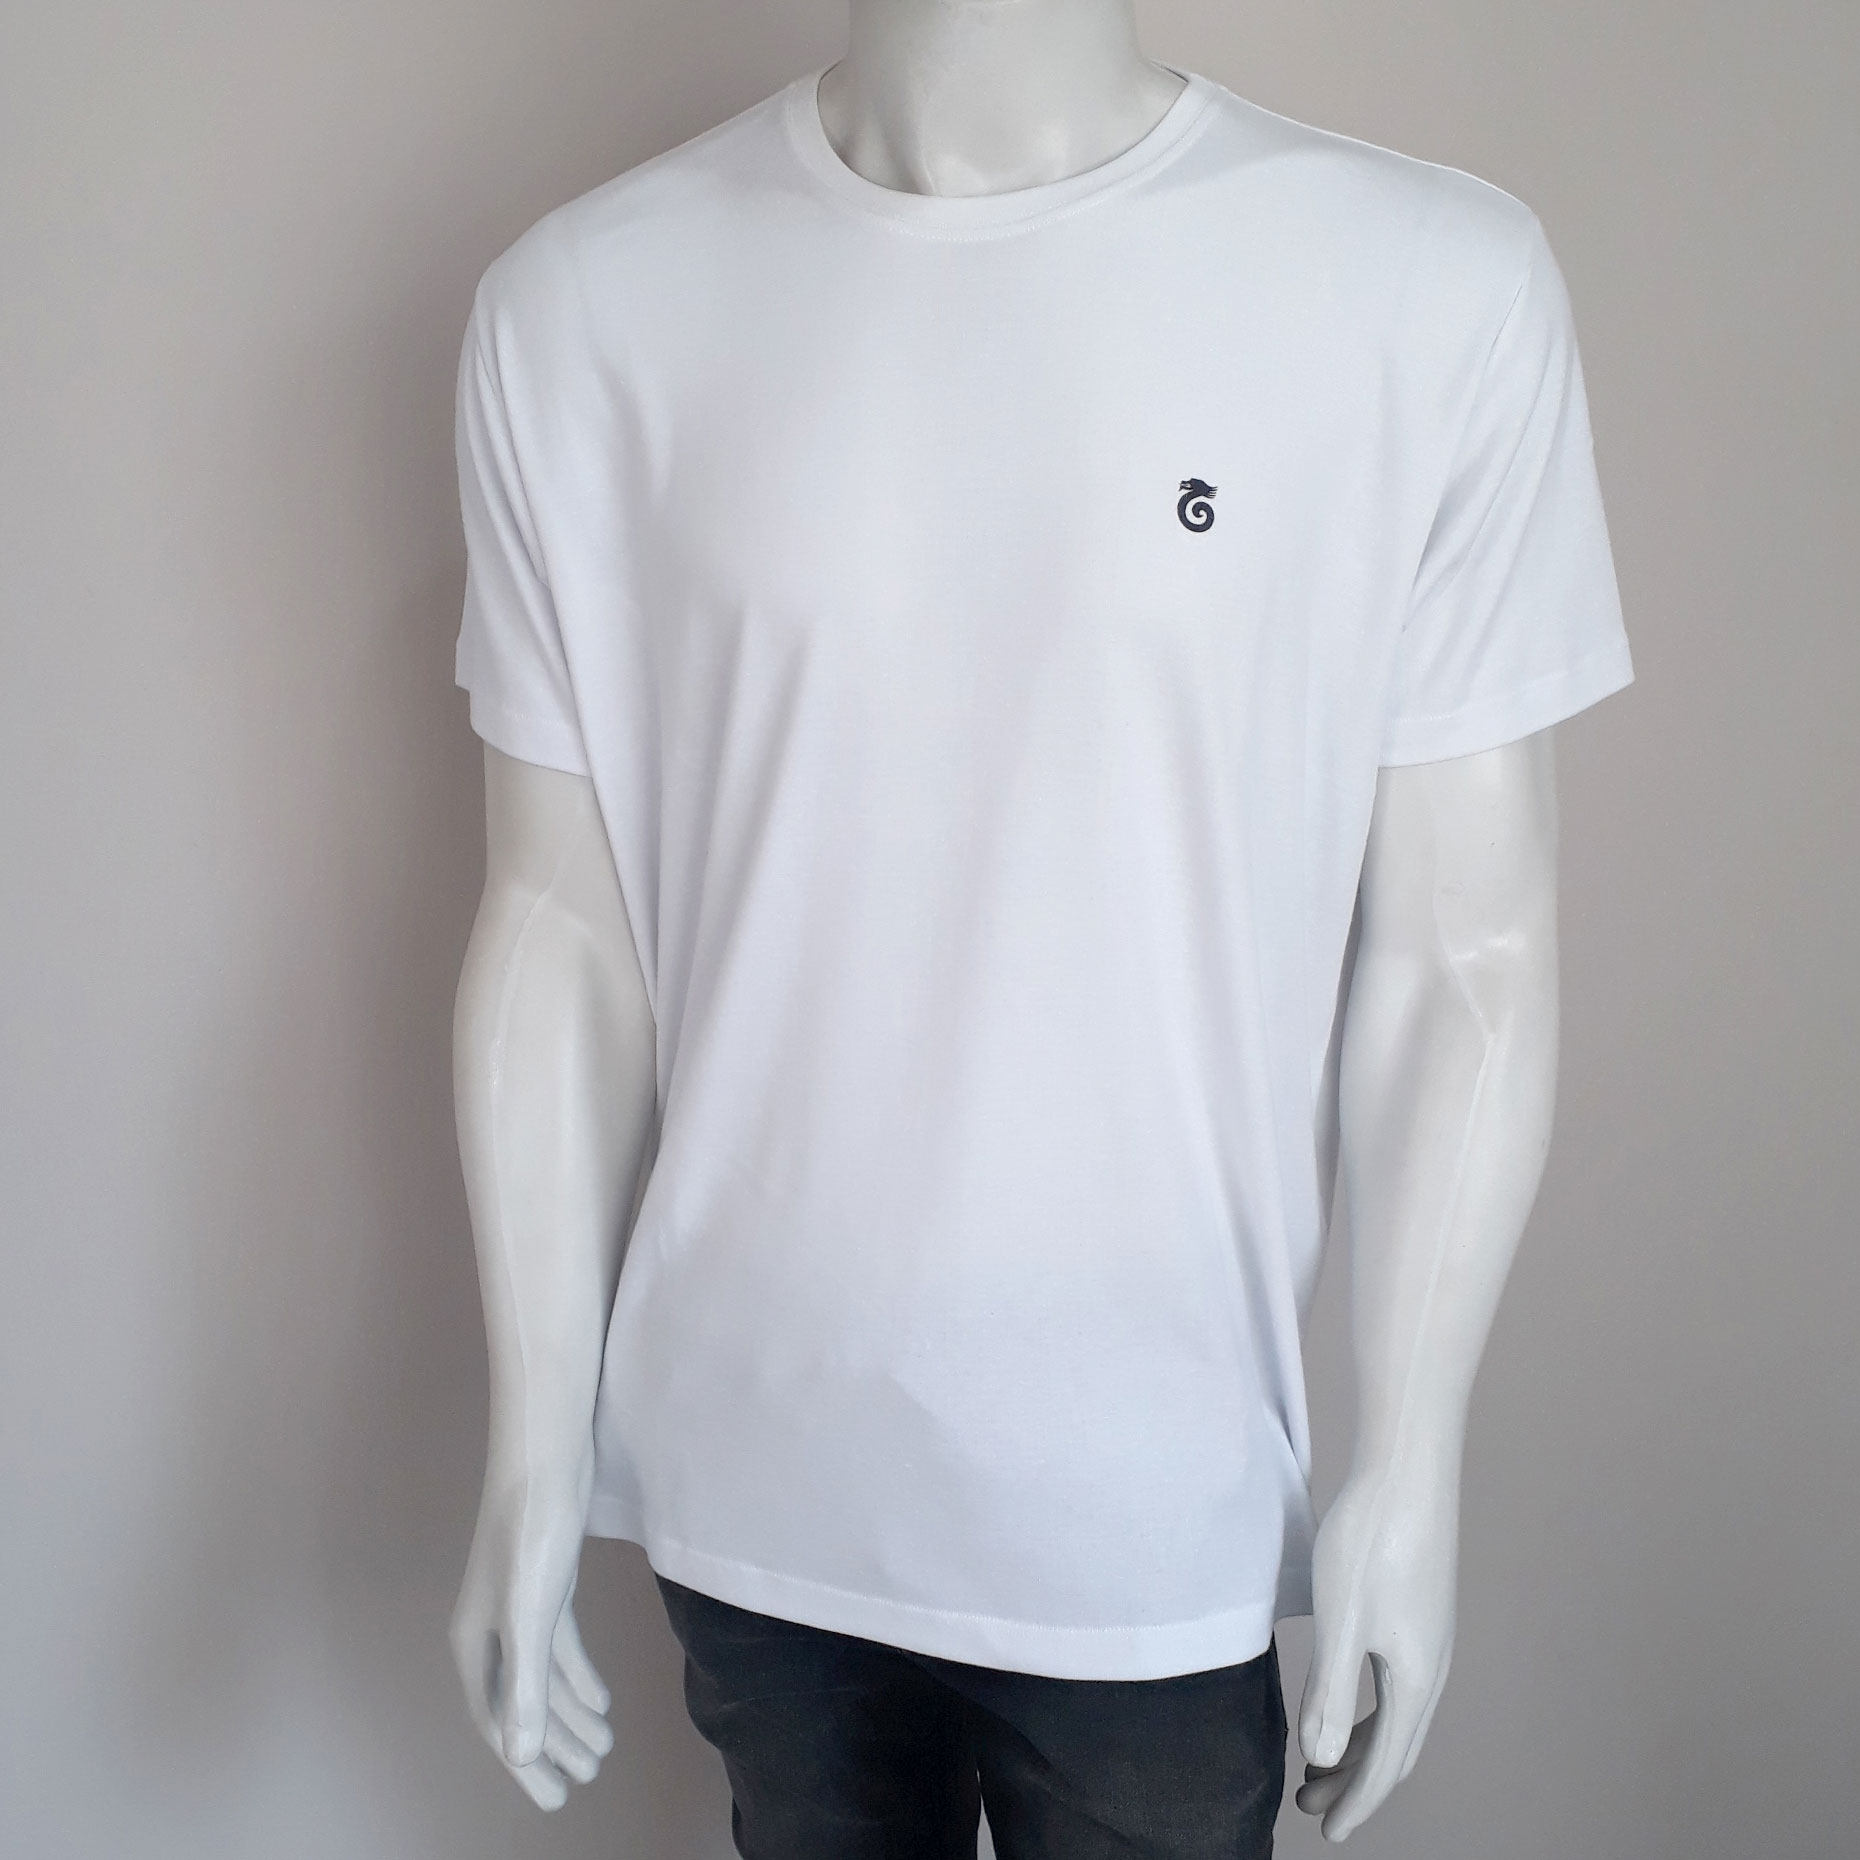 Camiseta Kayland Malhão k302 Branco - GG